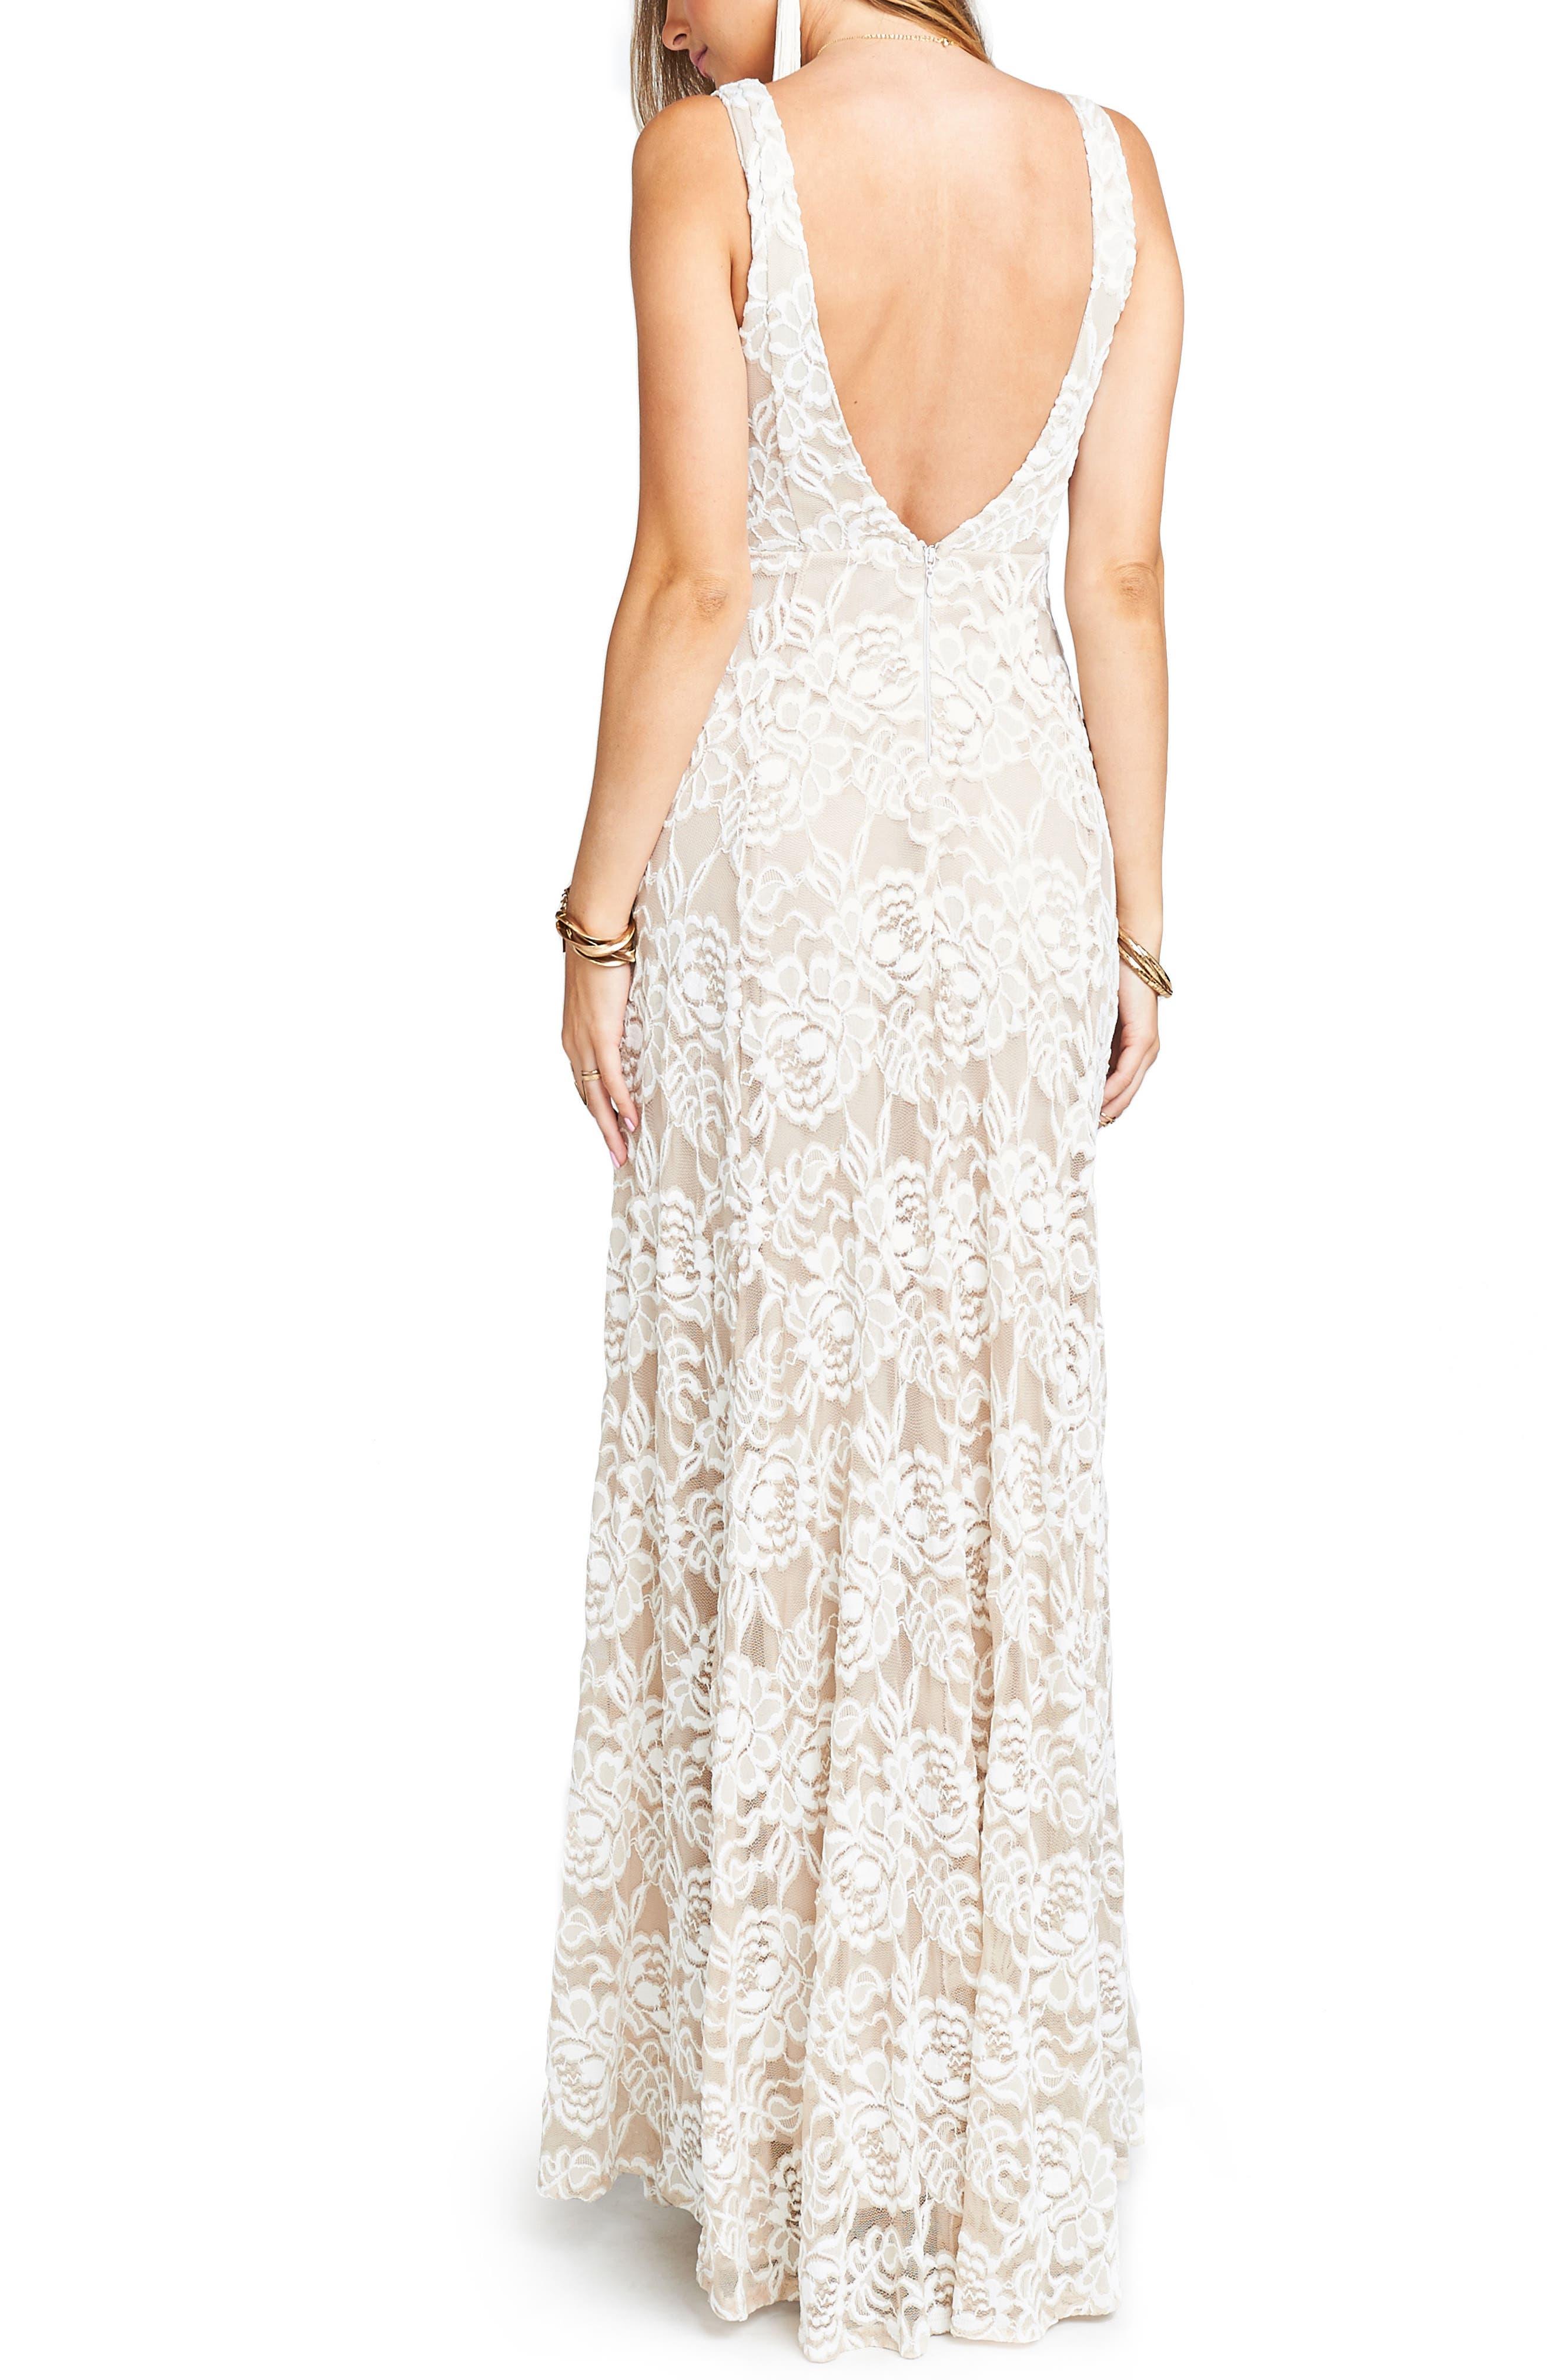 Jen Lace Dress,                             Alternate thumbnail 2, color,                             LOVERS LACE SHOW ME THE RING